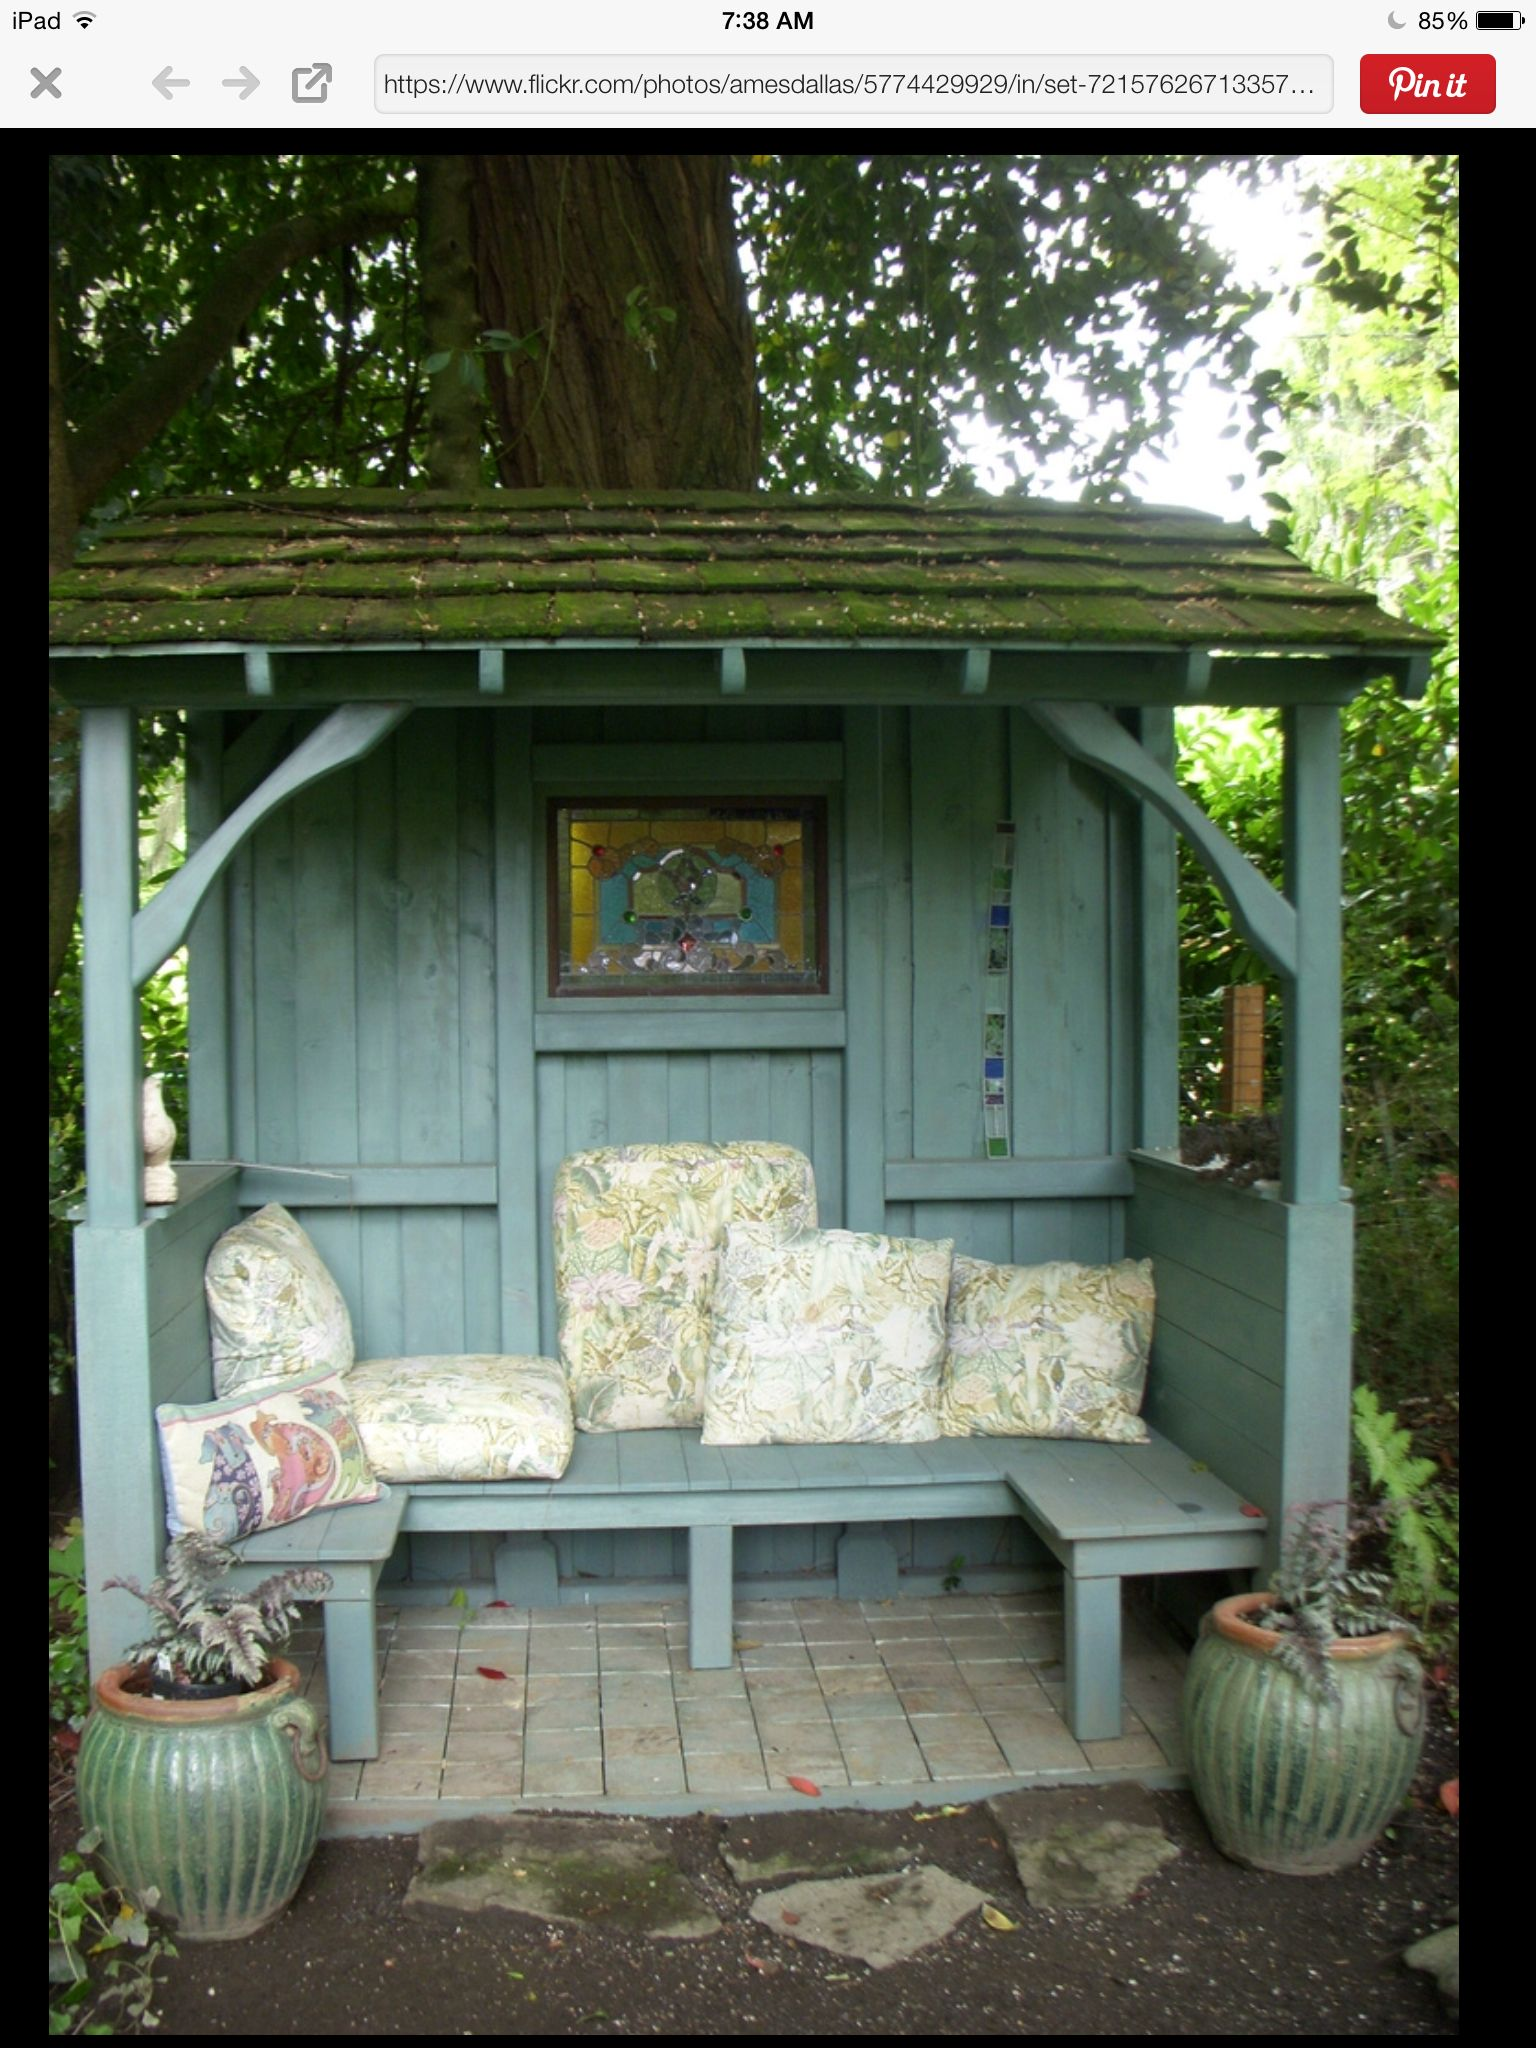 Pin by leanne lentschke on divider ideas pinterest garden